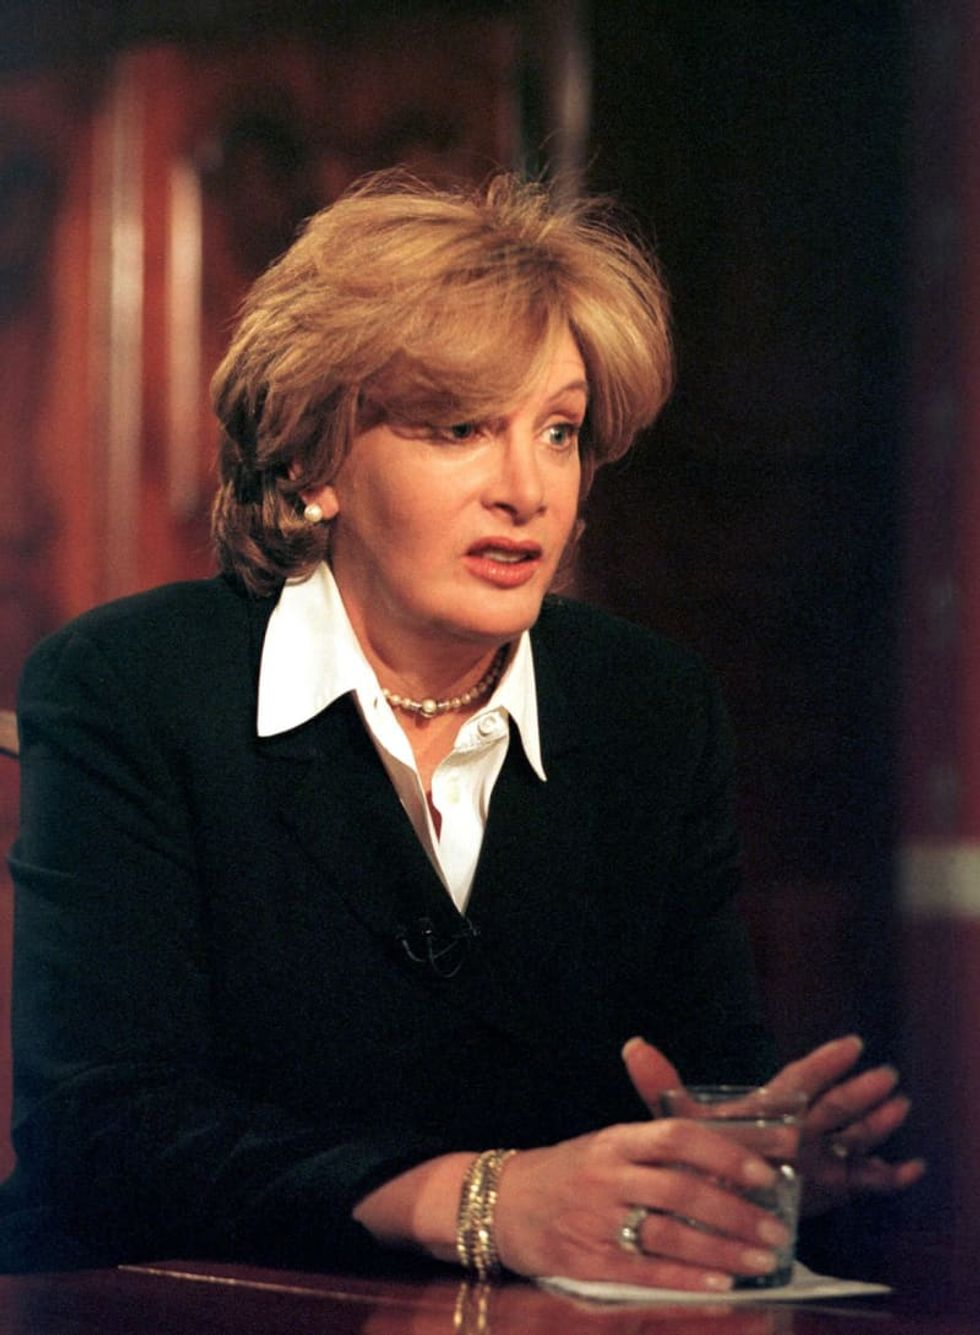 Linda Tripp, central figure in Bill Clinton's impeachment, dies at 70